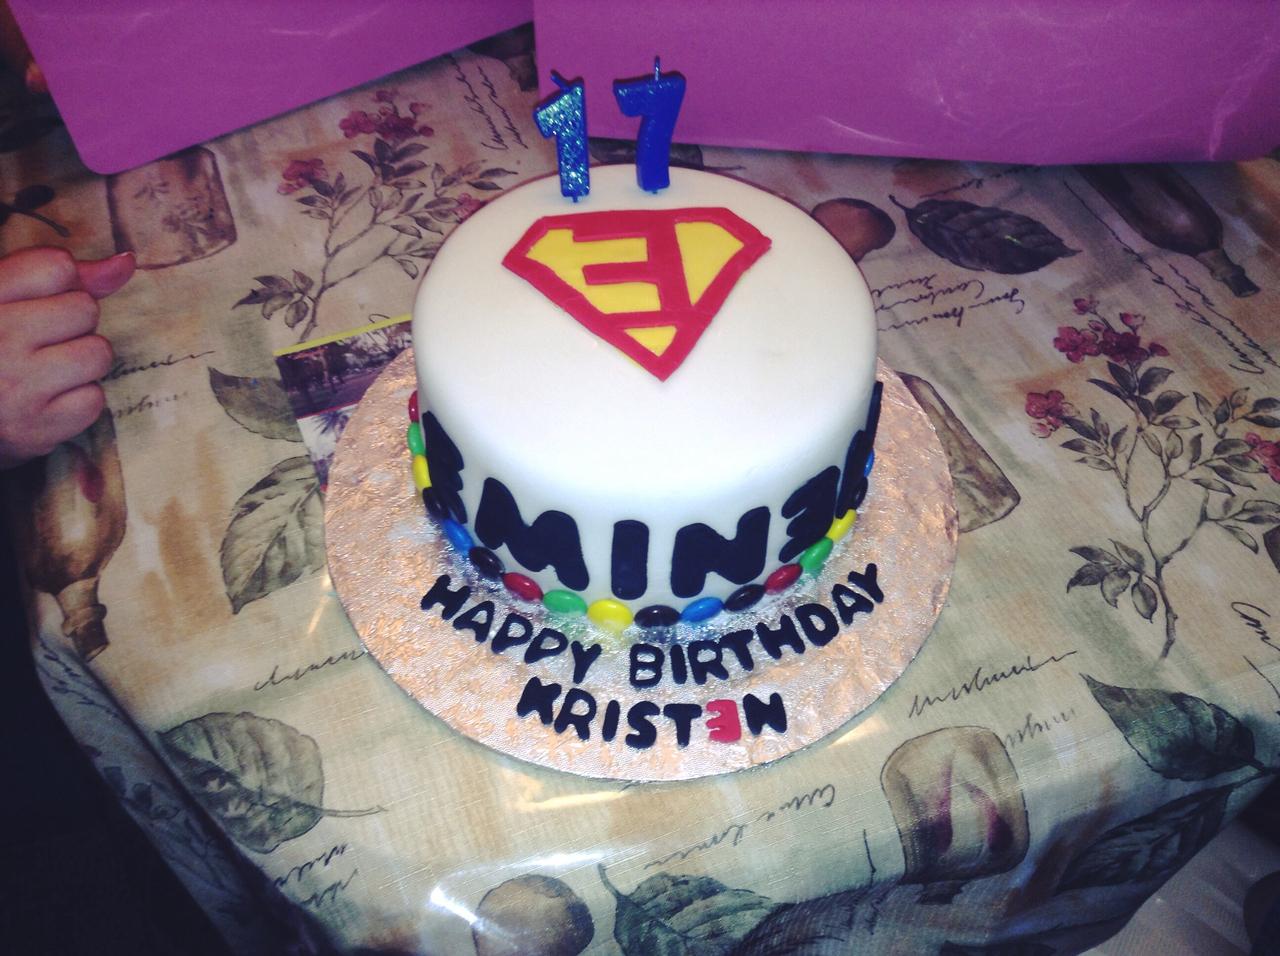 Phenomenal Eminem Inspired Cake Discovered By K On We Heart It Funny Birthday Cards Online Bapapcheapnameinfo